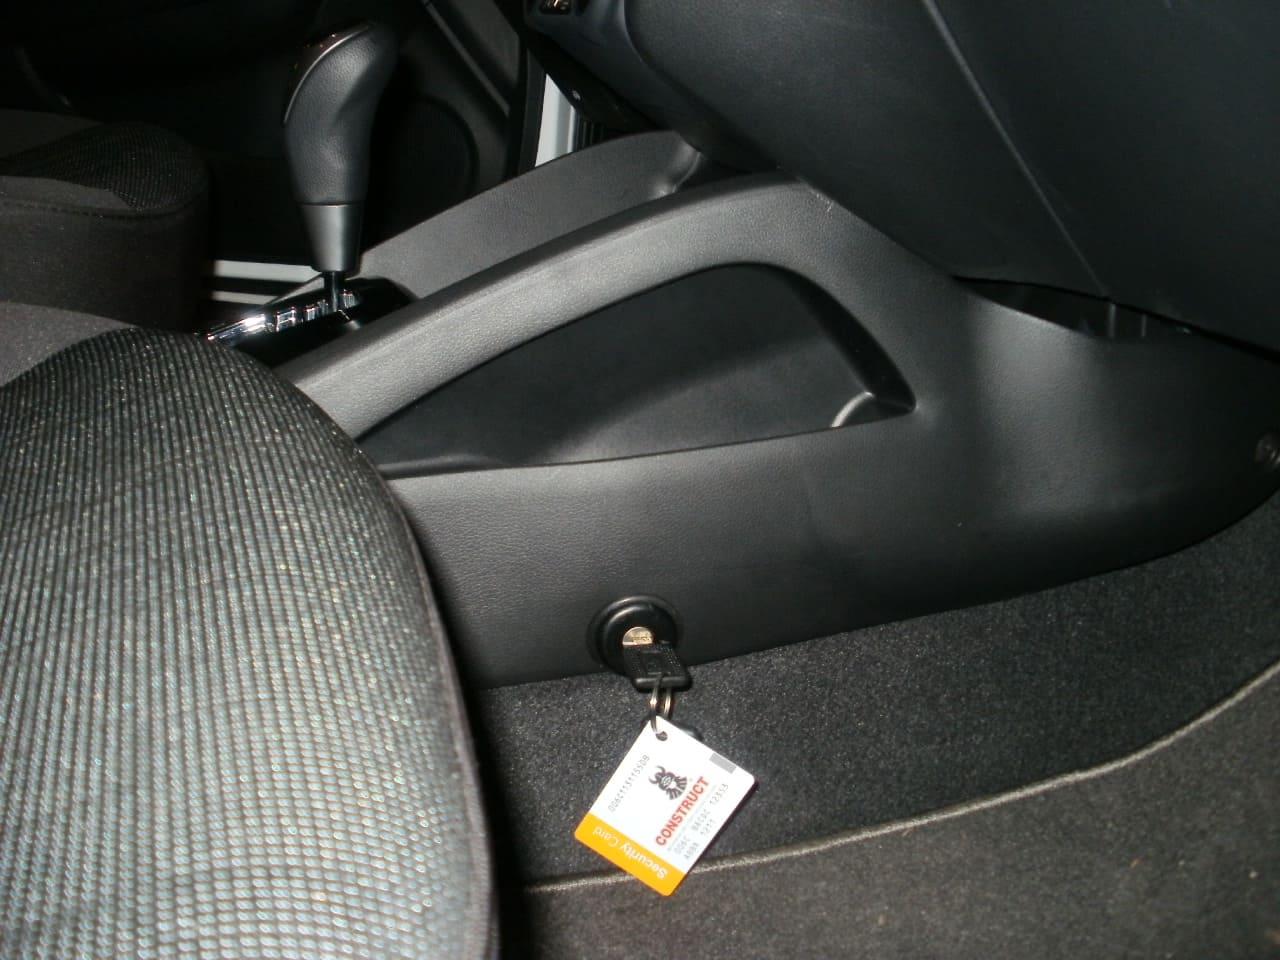 замок на кпп констракт на Hyundai Accent